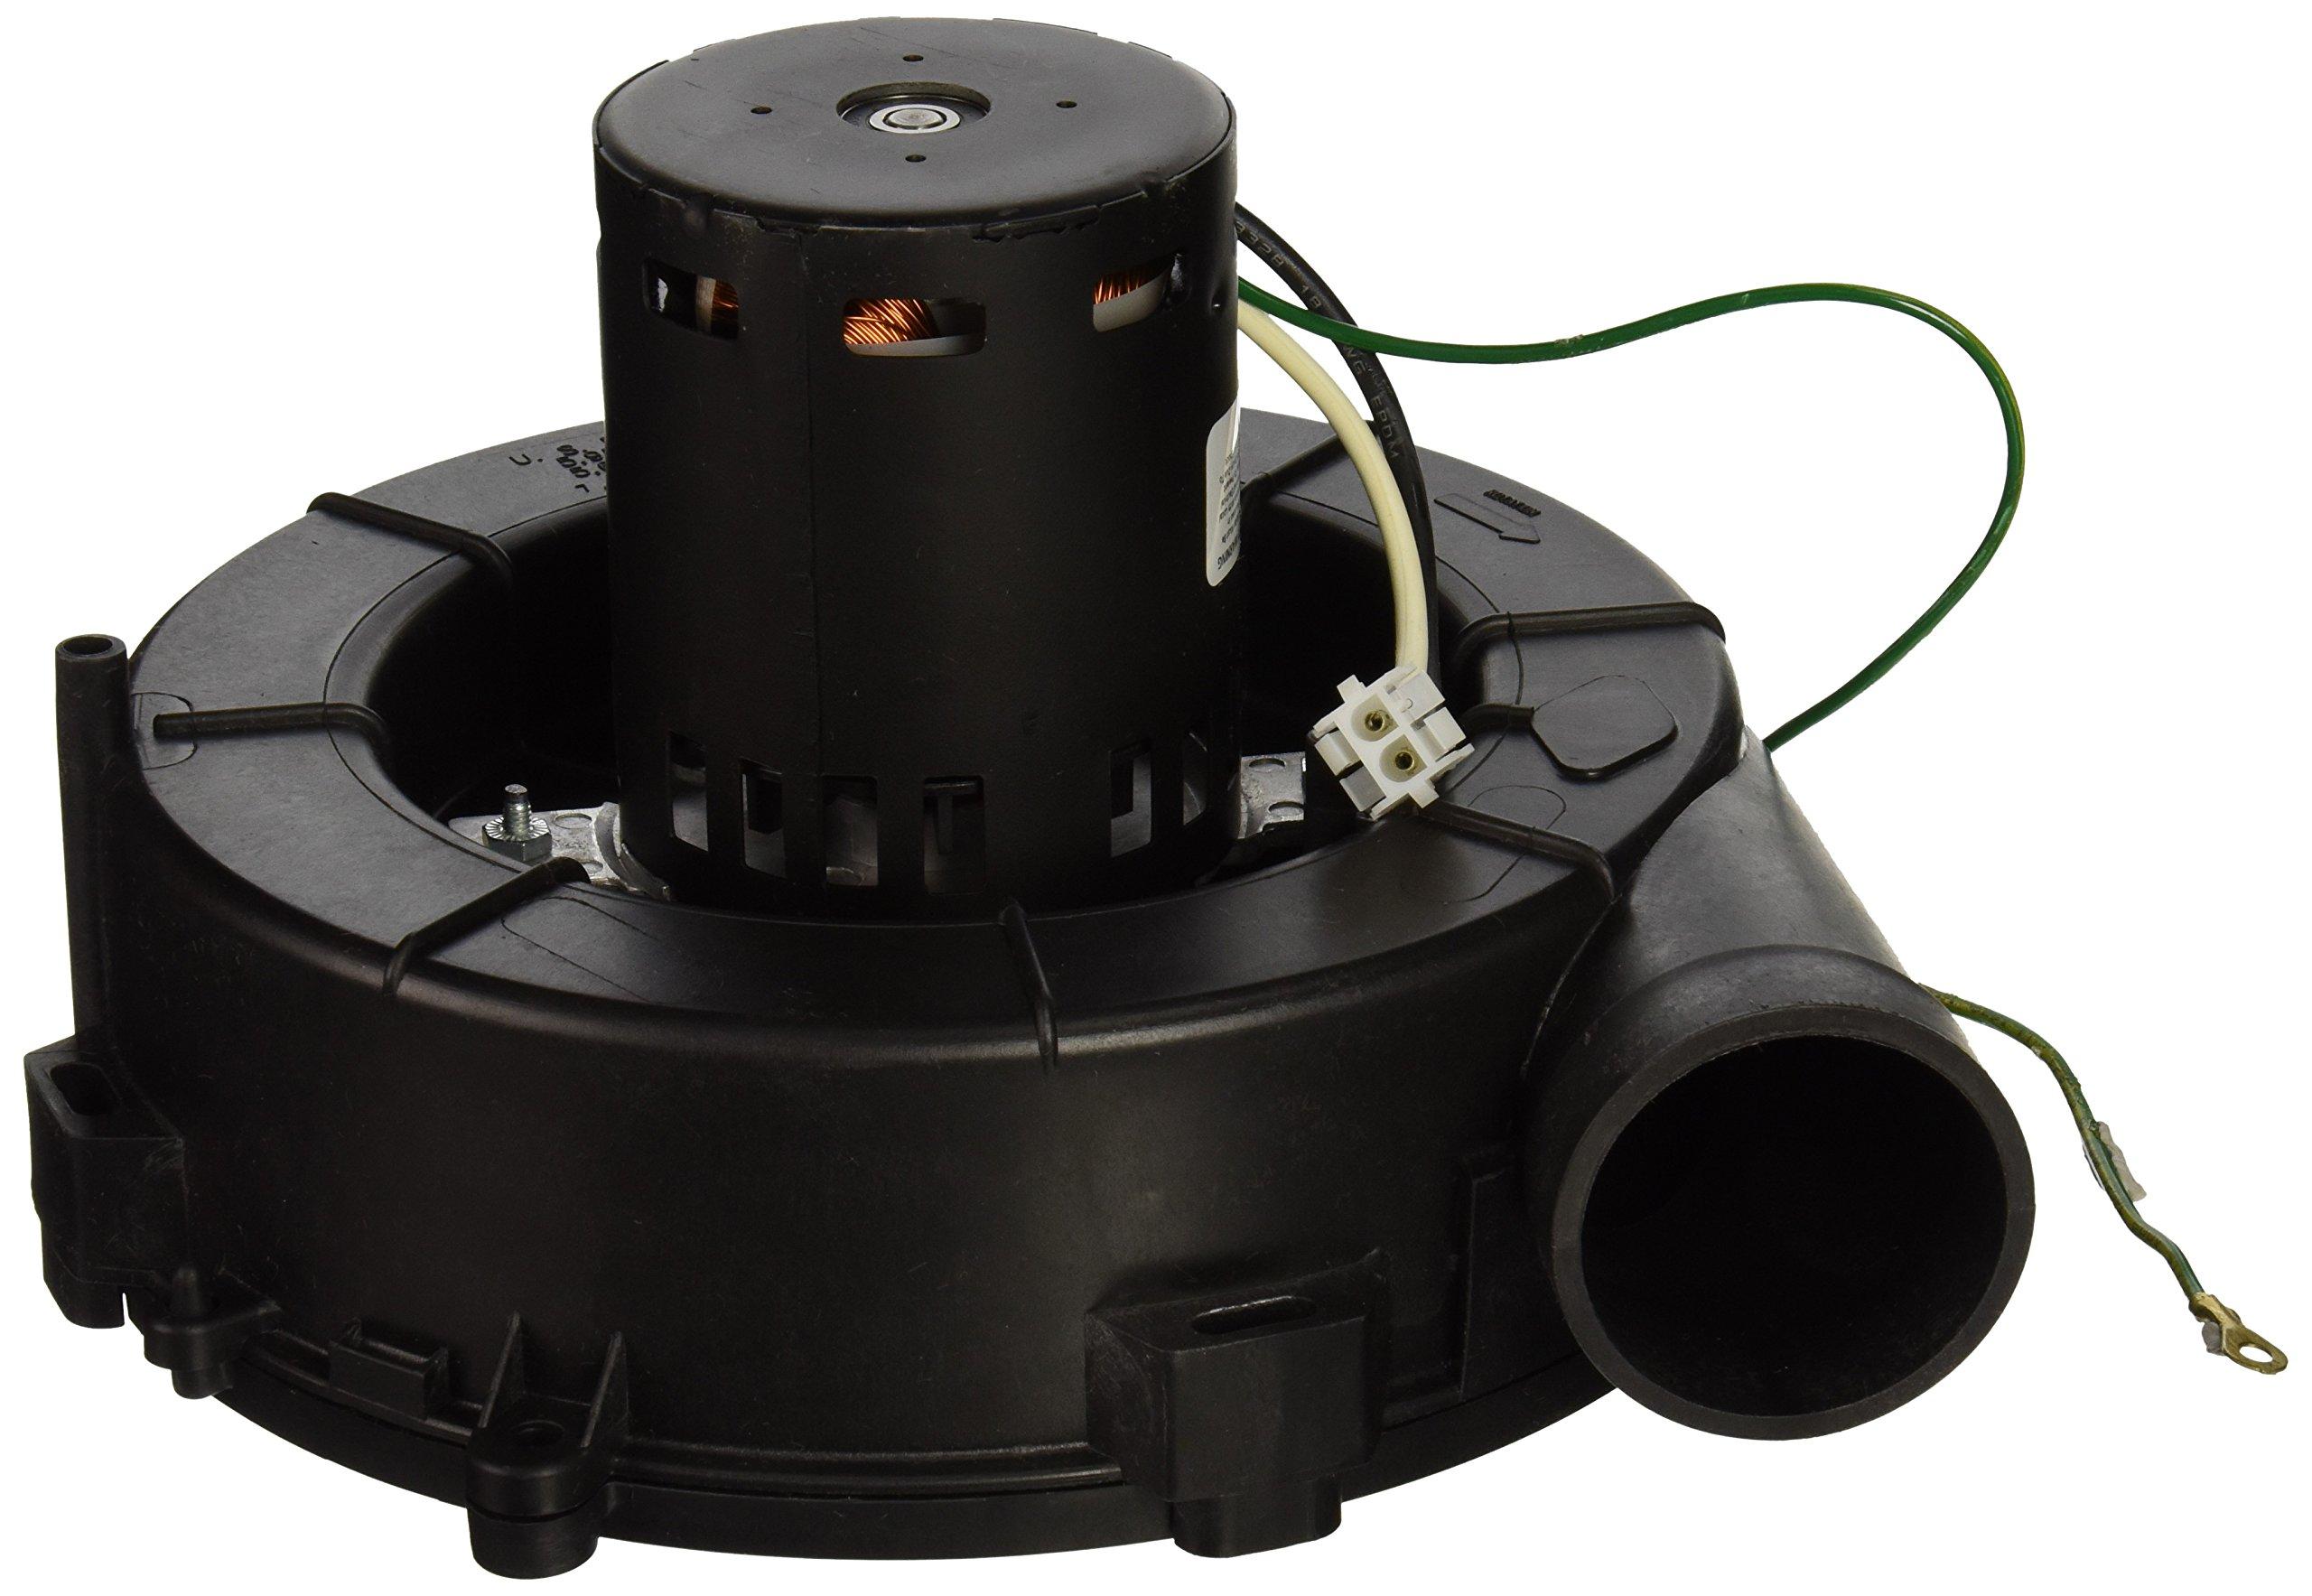 Fasco A163 1-Speed 151-500 CFM Lennox Draft Inducer Motor, 115V, 3400 rpm